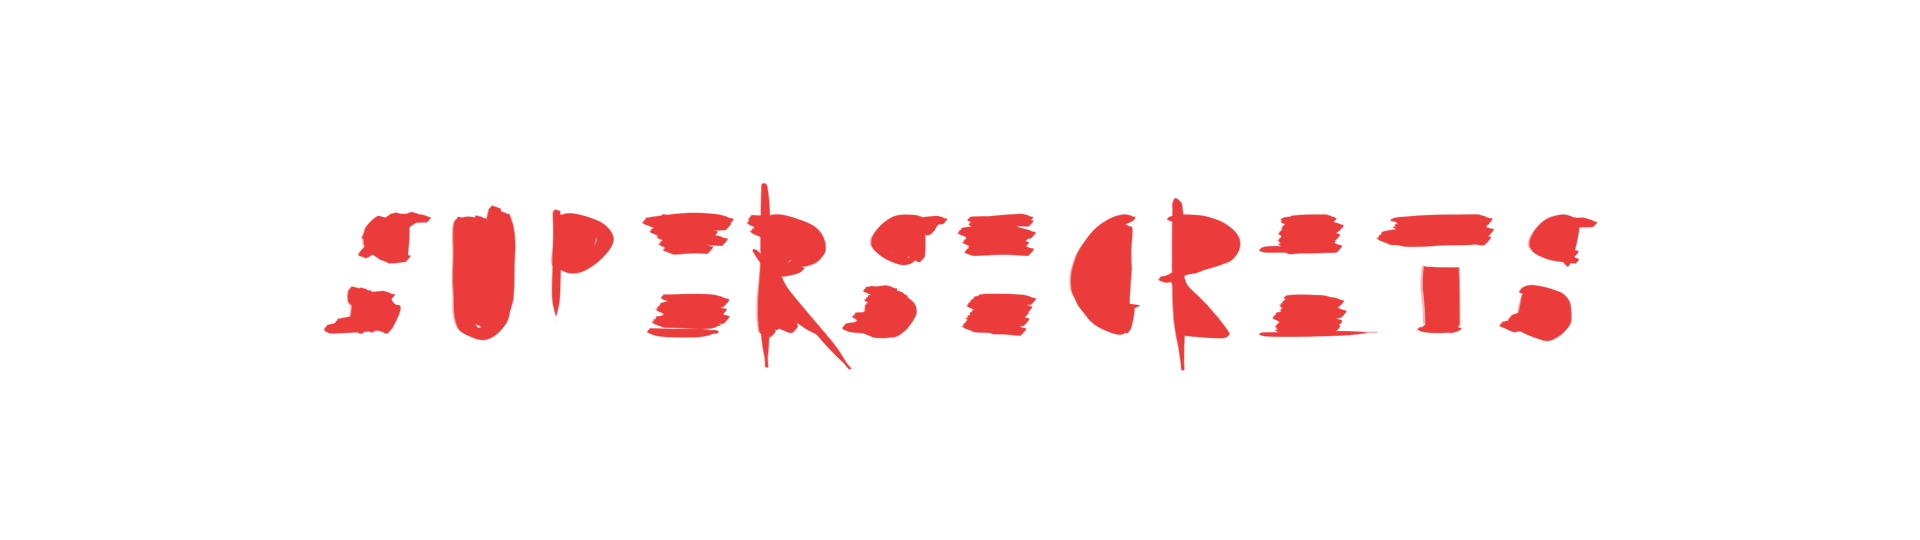 "Logodesign ""Supersecrets"" - Band"